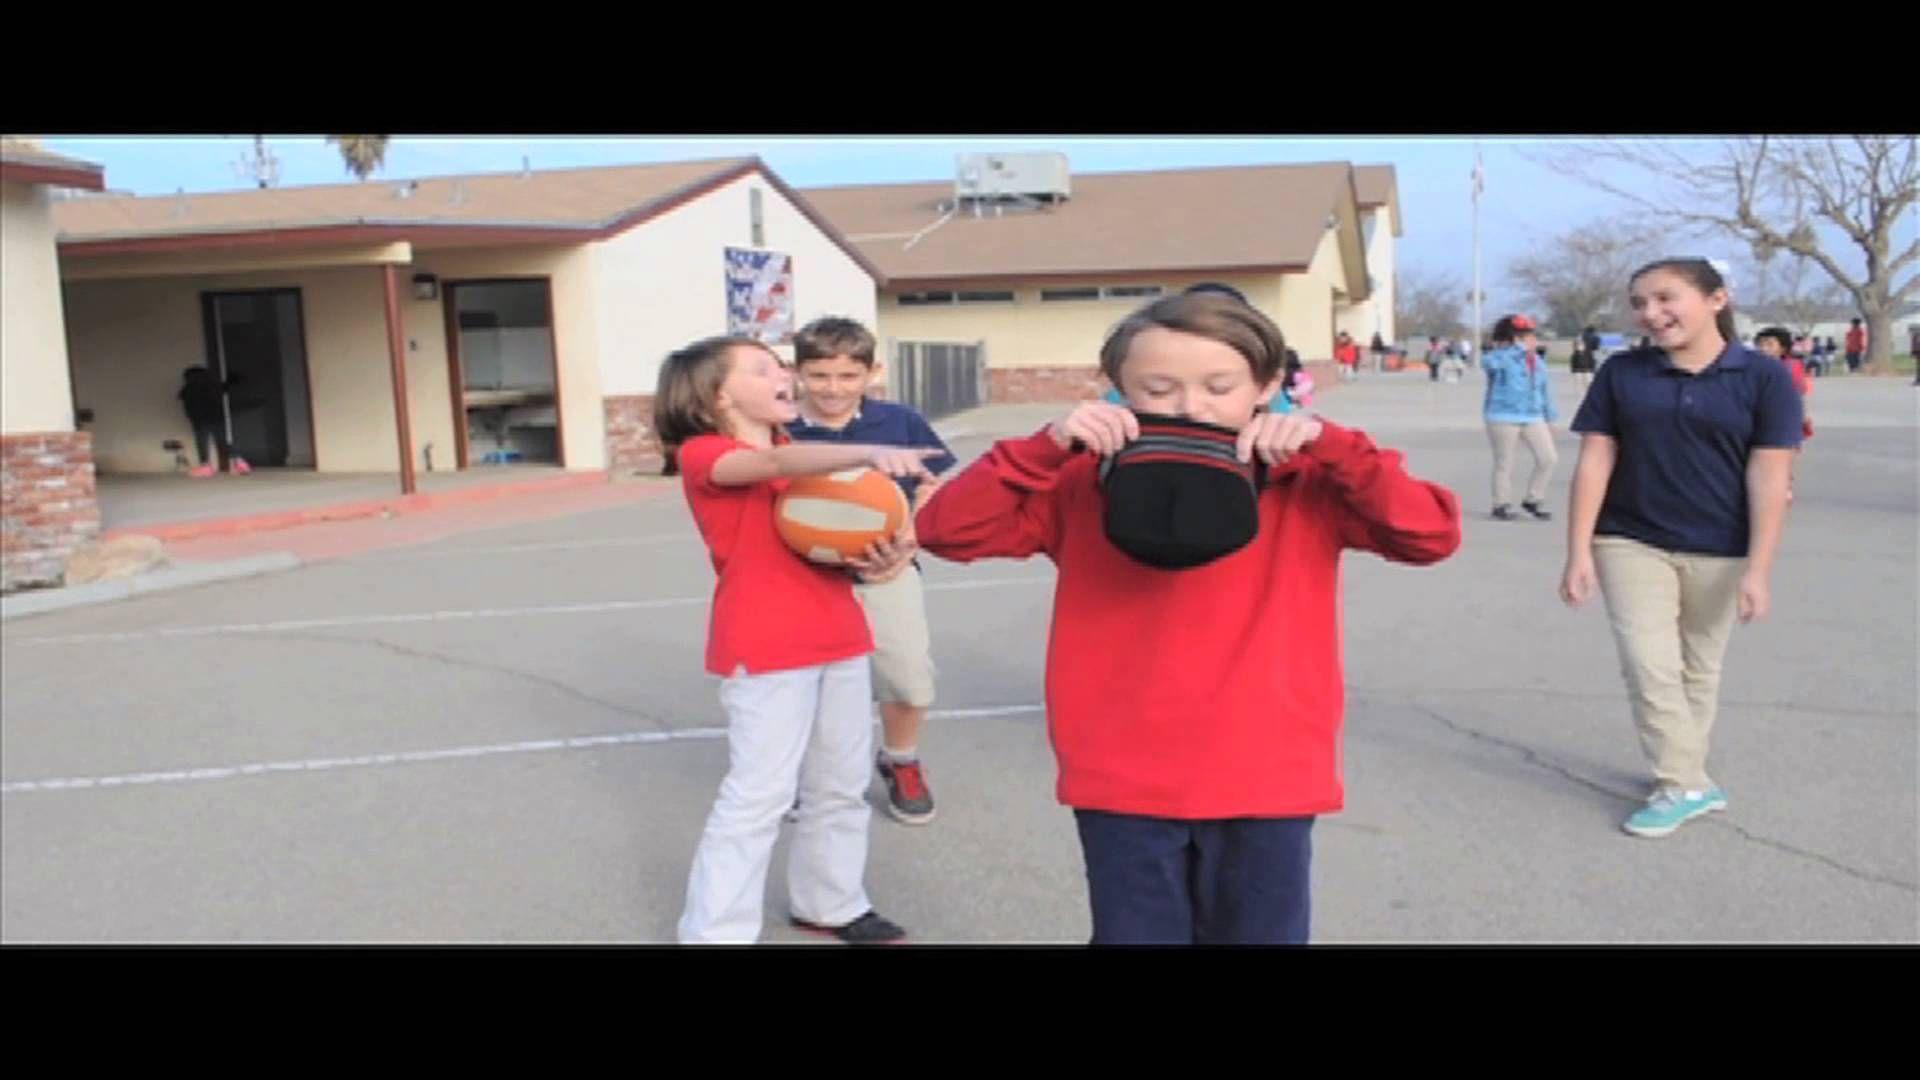 Habit 4 Think Win Win Kid Made Video